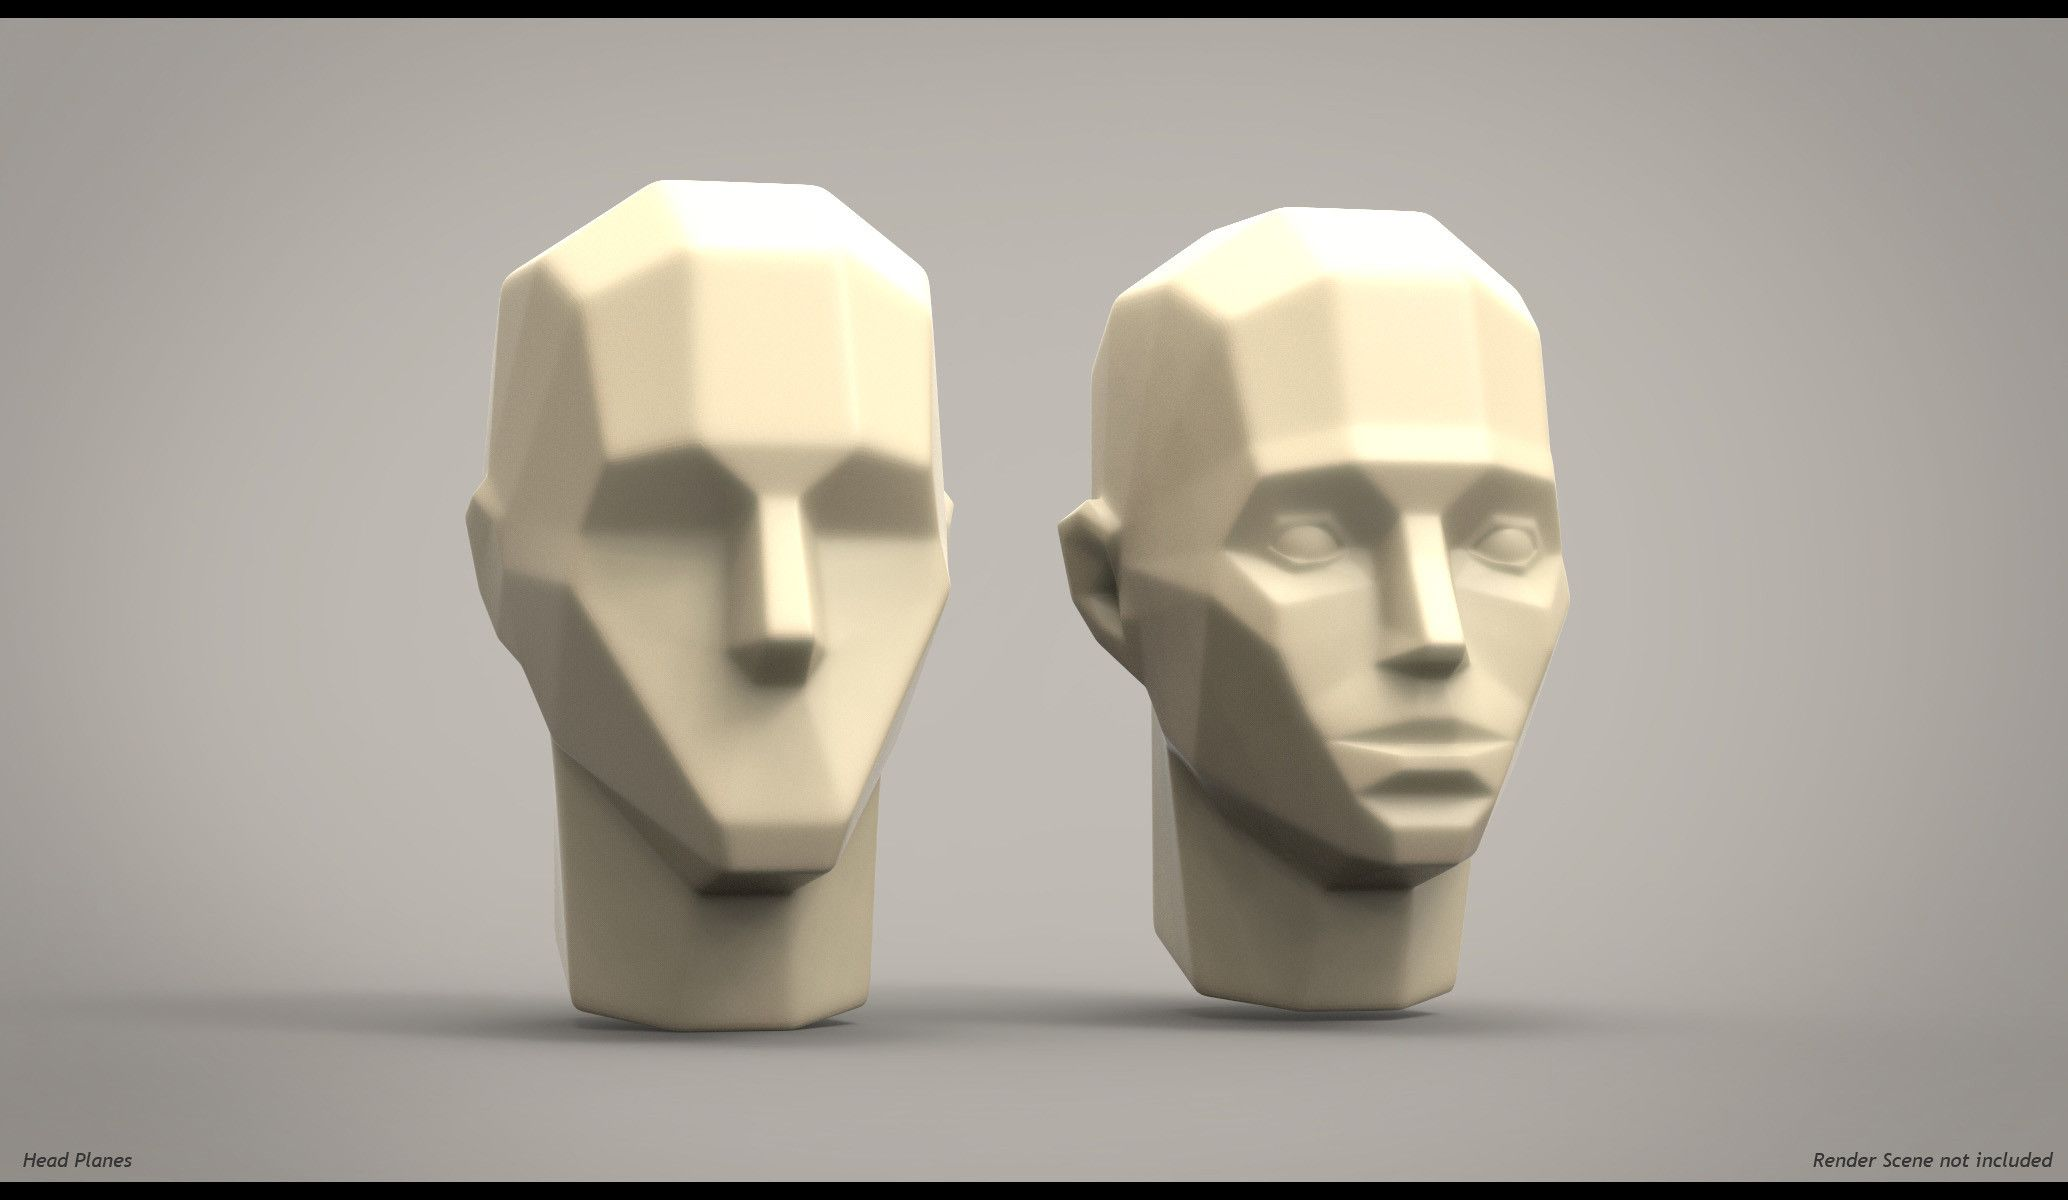 http://www.turbosquid.com/3d-models/3d-model-planes-head-anatomy ...